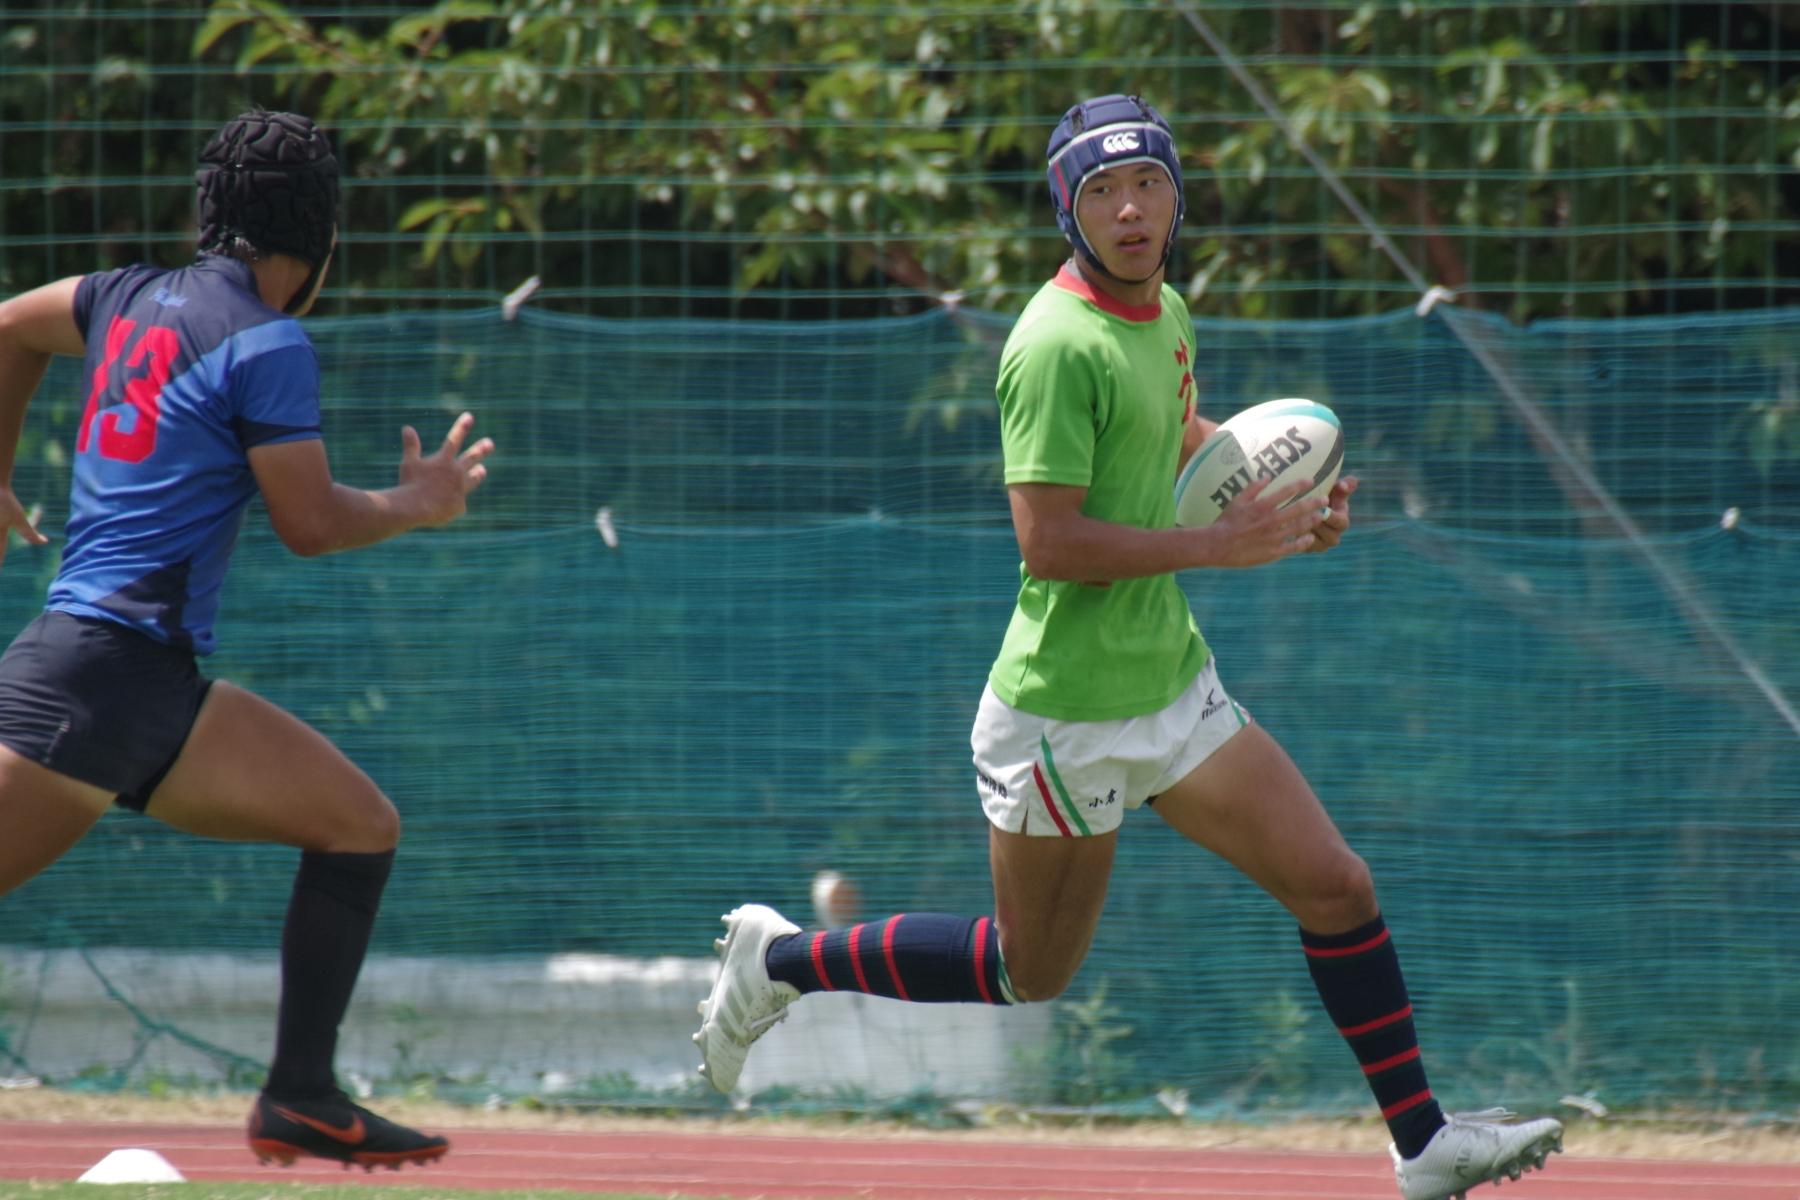 http://kokura-rugby.sakura.ne.jp/180728_110036_0269.jpg